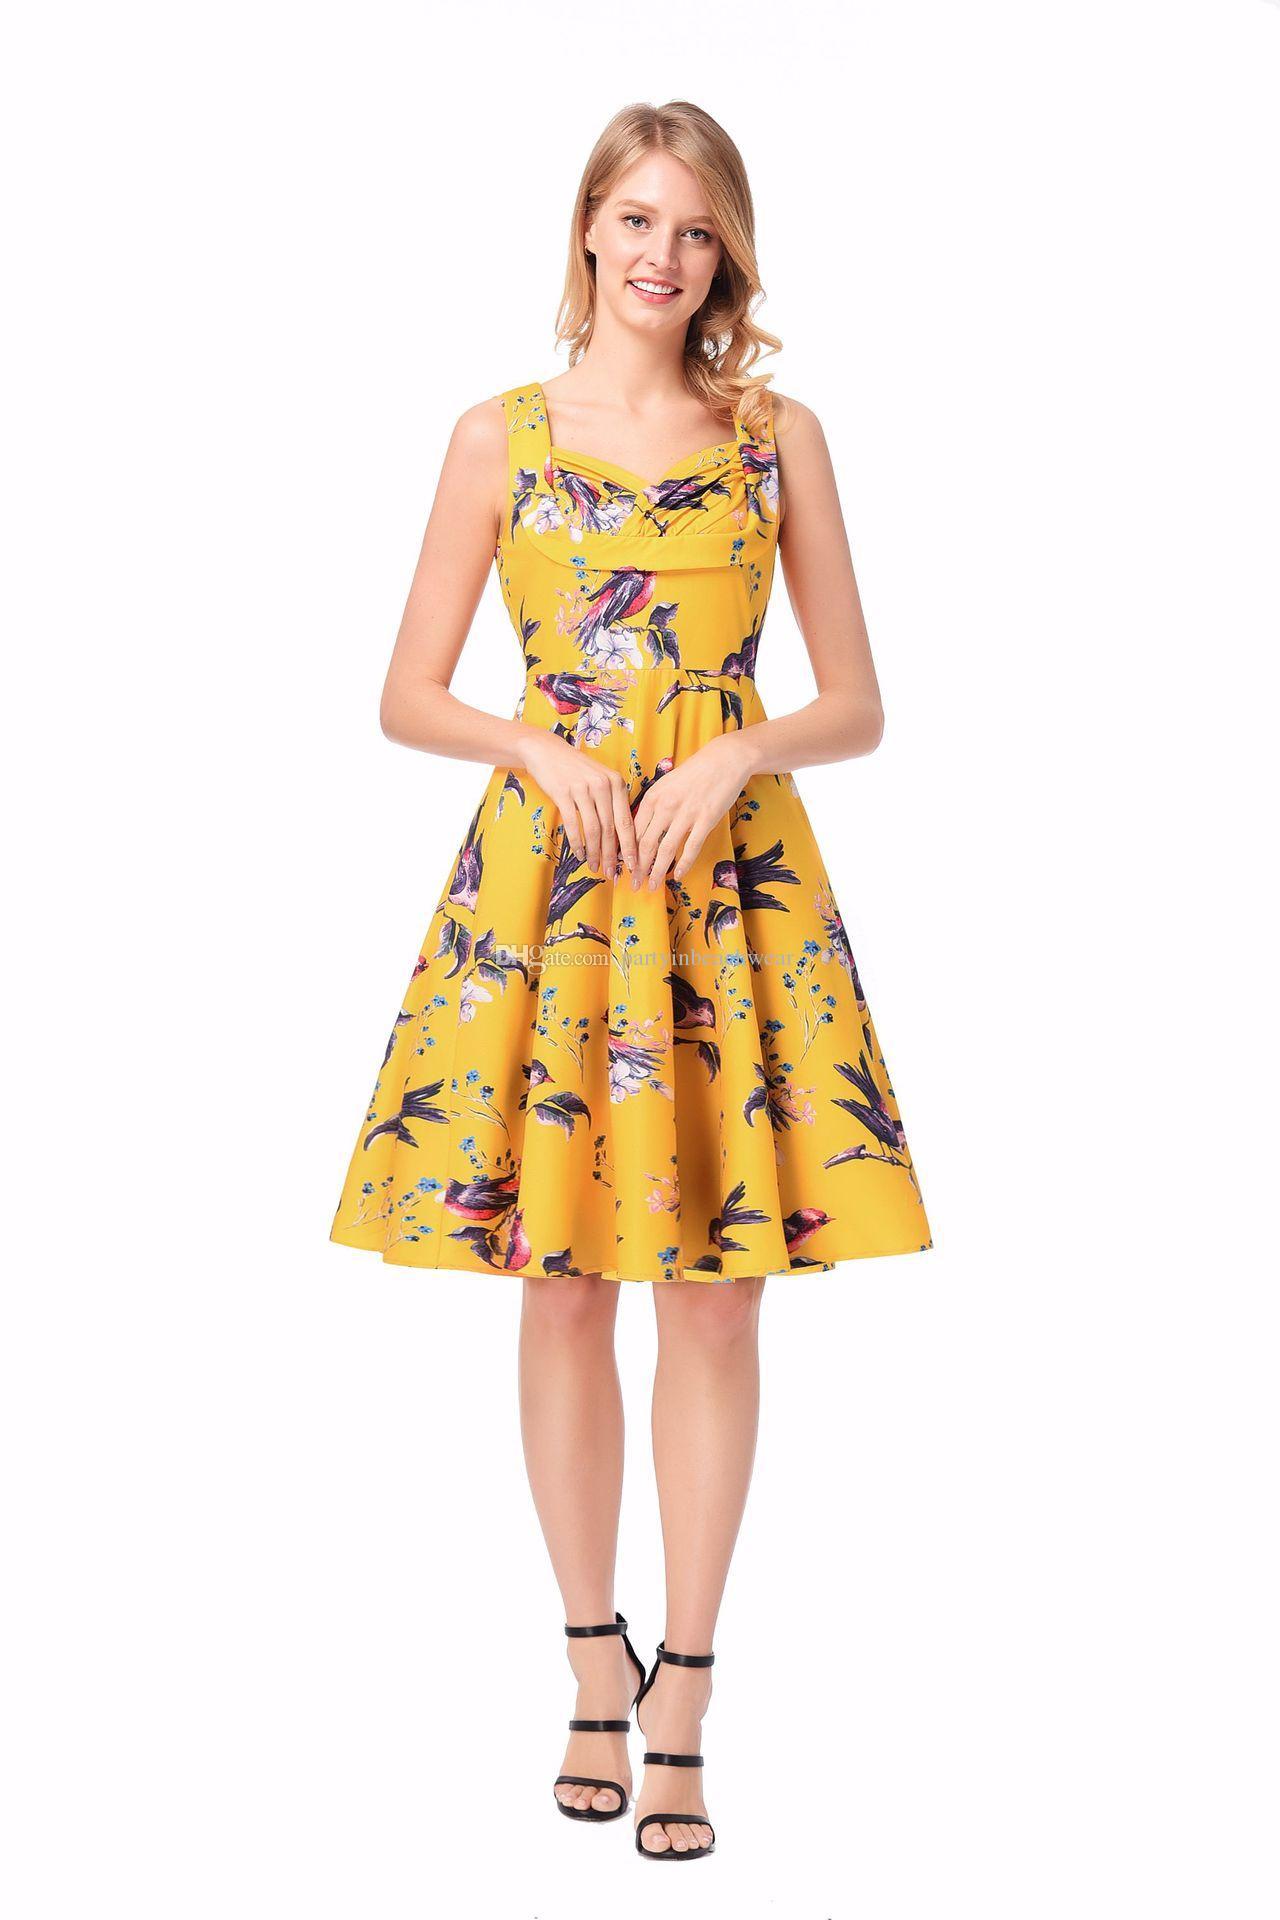 83066bdc10 Women Summer Party Dress Floral Print Single Breasted Lapel POLO Collar Evening  Dress Sleeveless High Waist A Line S 2XL Plus Size Womens Sundresses Womens  ...